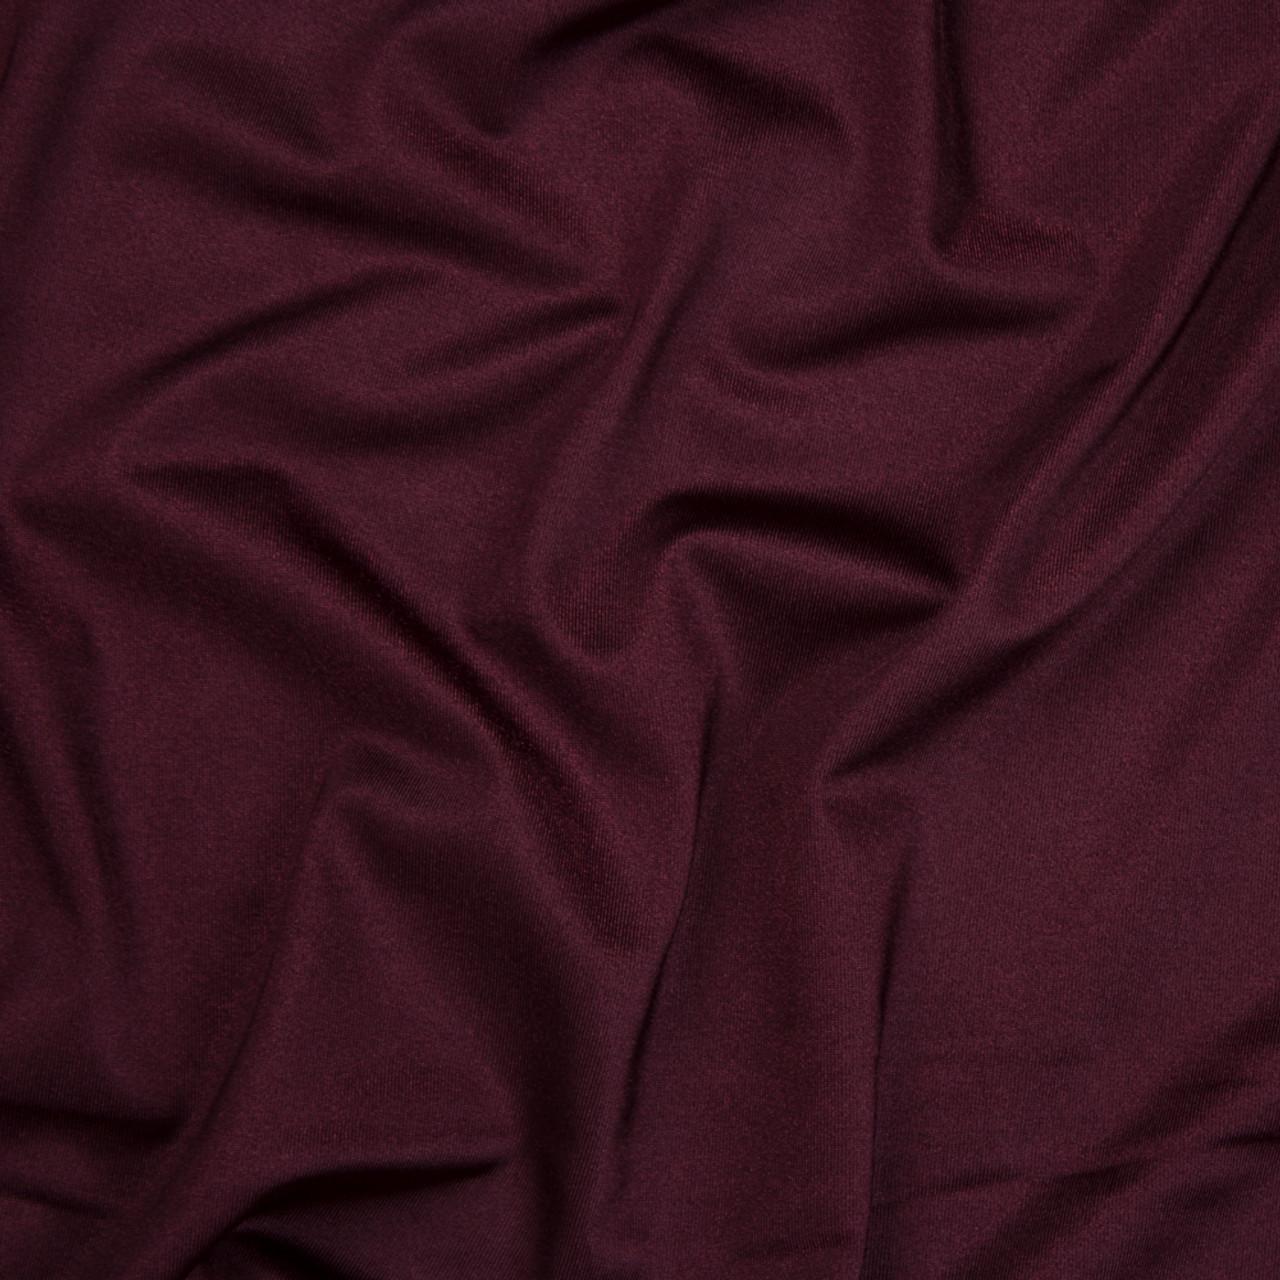 13c225364b7 ... Wine Shiny 4-way Stretch Nylon/Lycra Fabric By The Yard - Wide shot